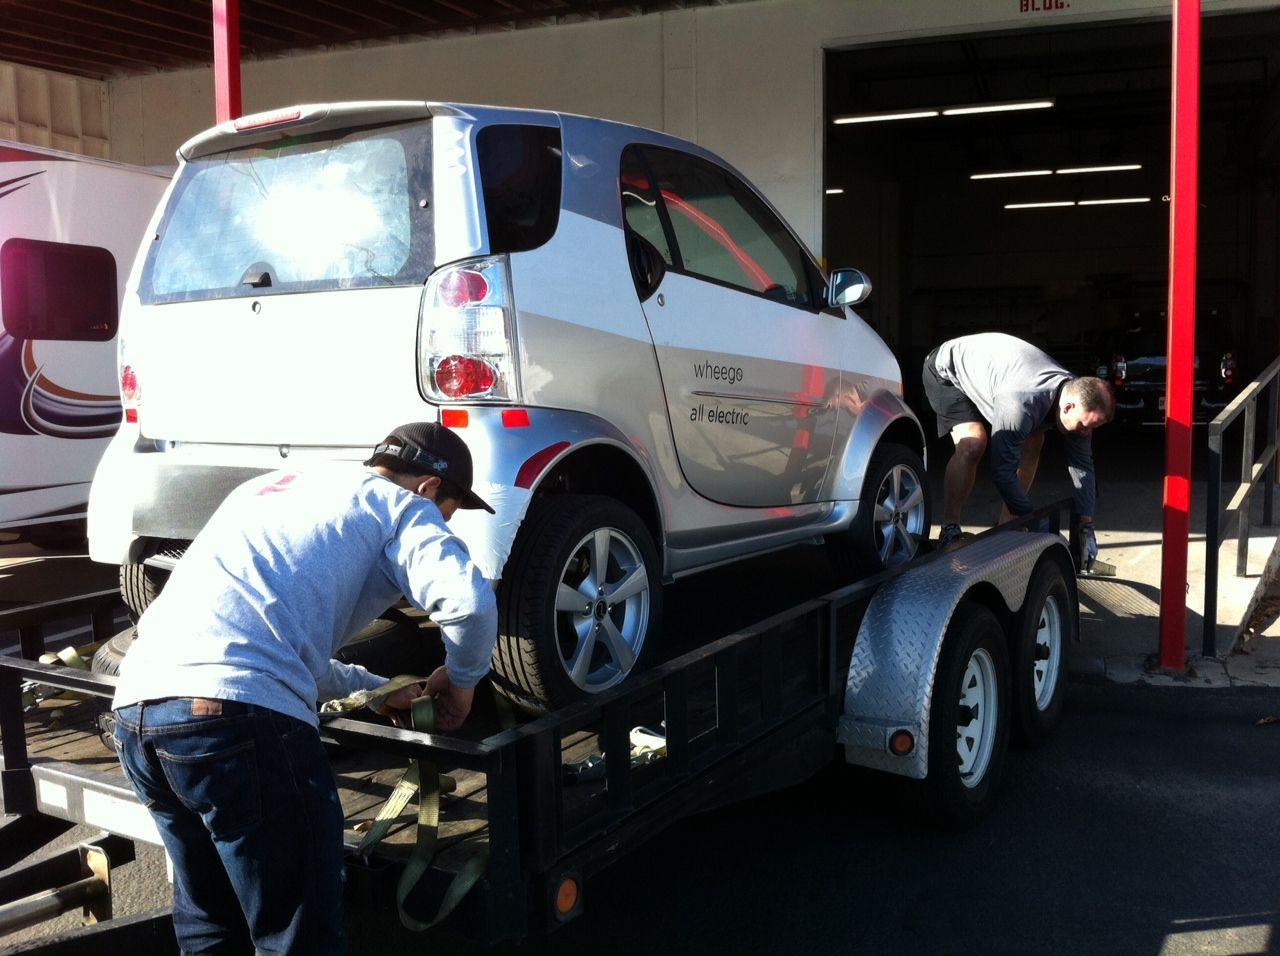 Assembling a new batch of Wheego LiFe EVs December 2012!